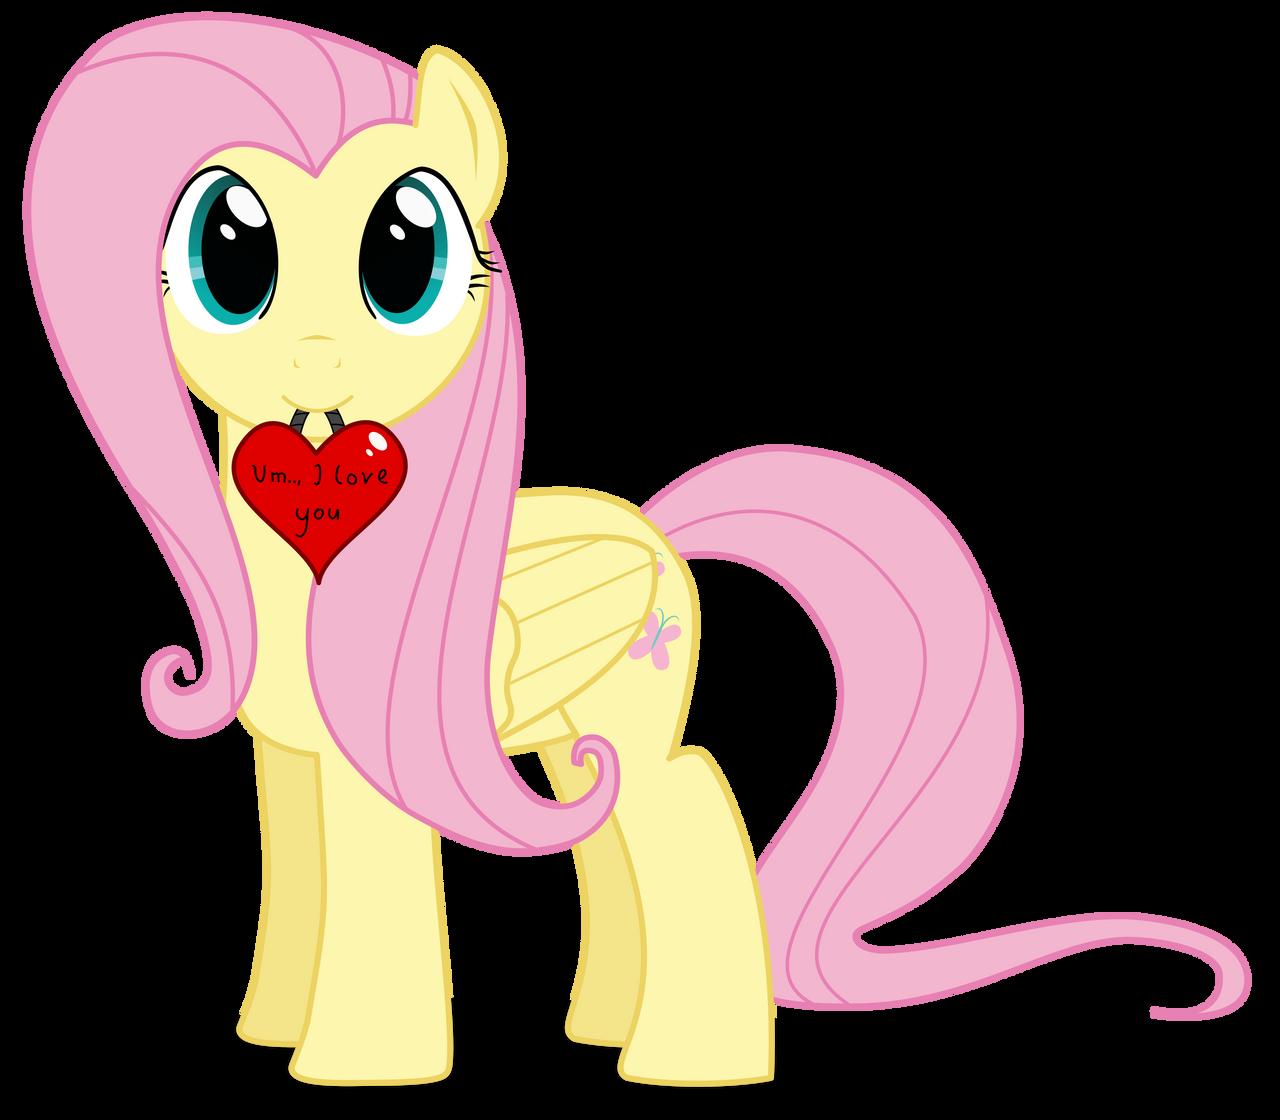 Fluttershy: Um.., I love you! by TBCroco on DeviantArt